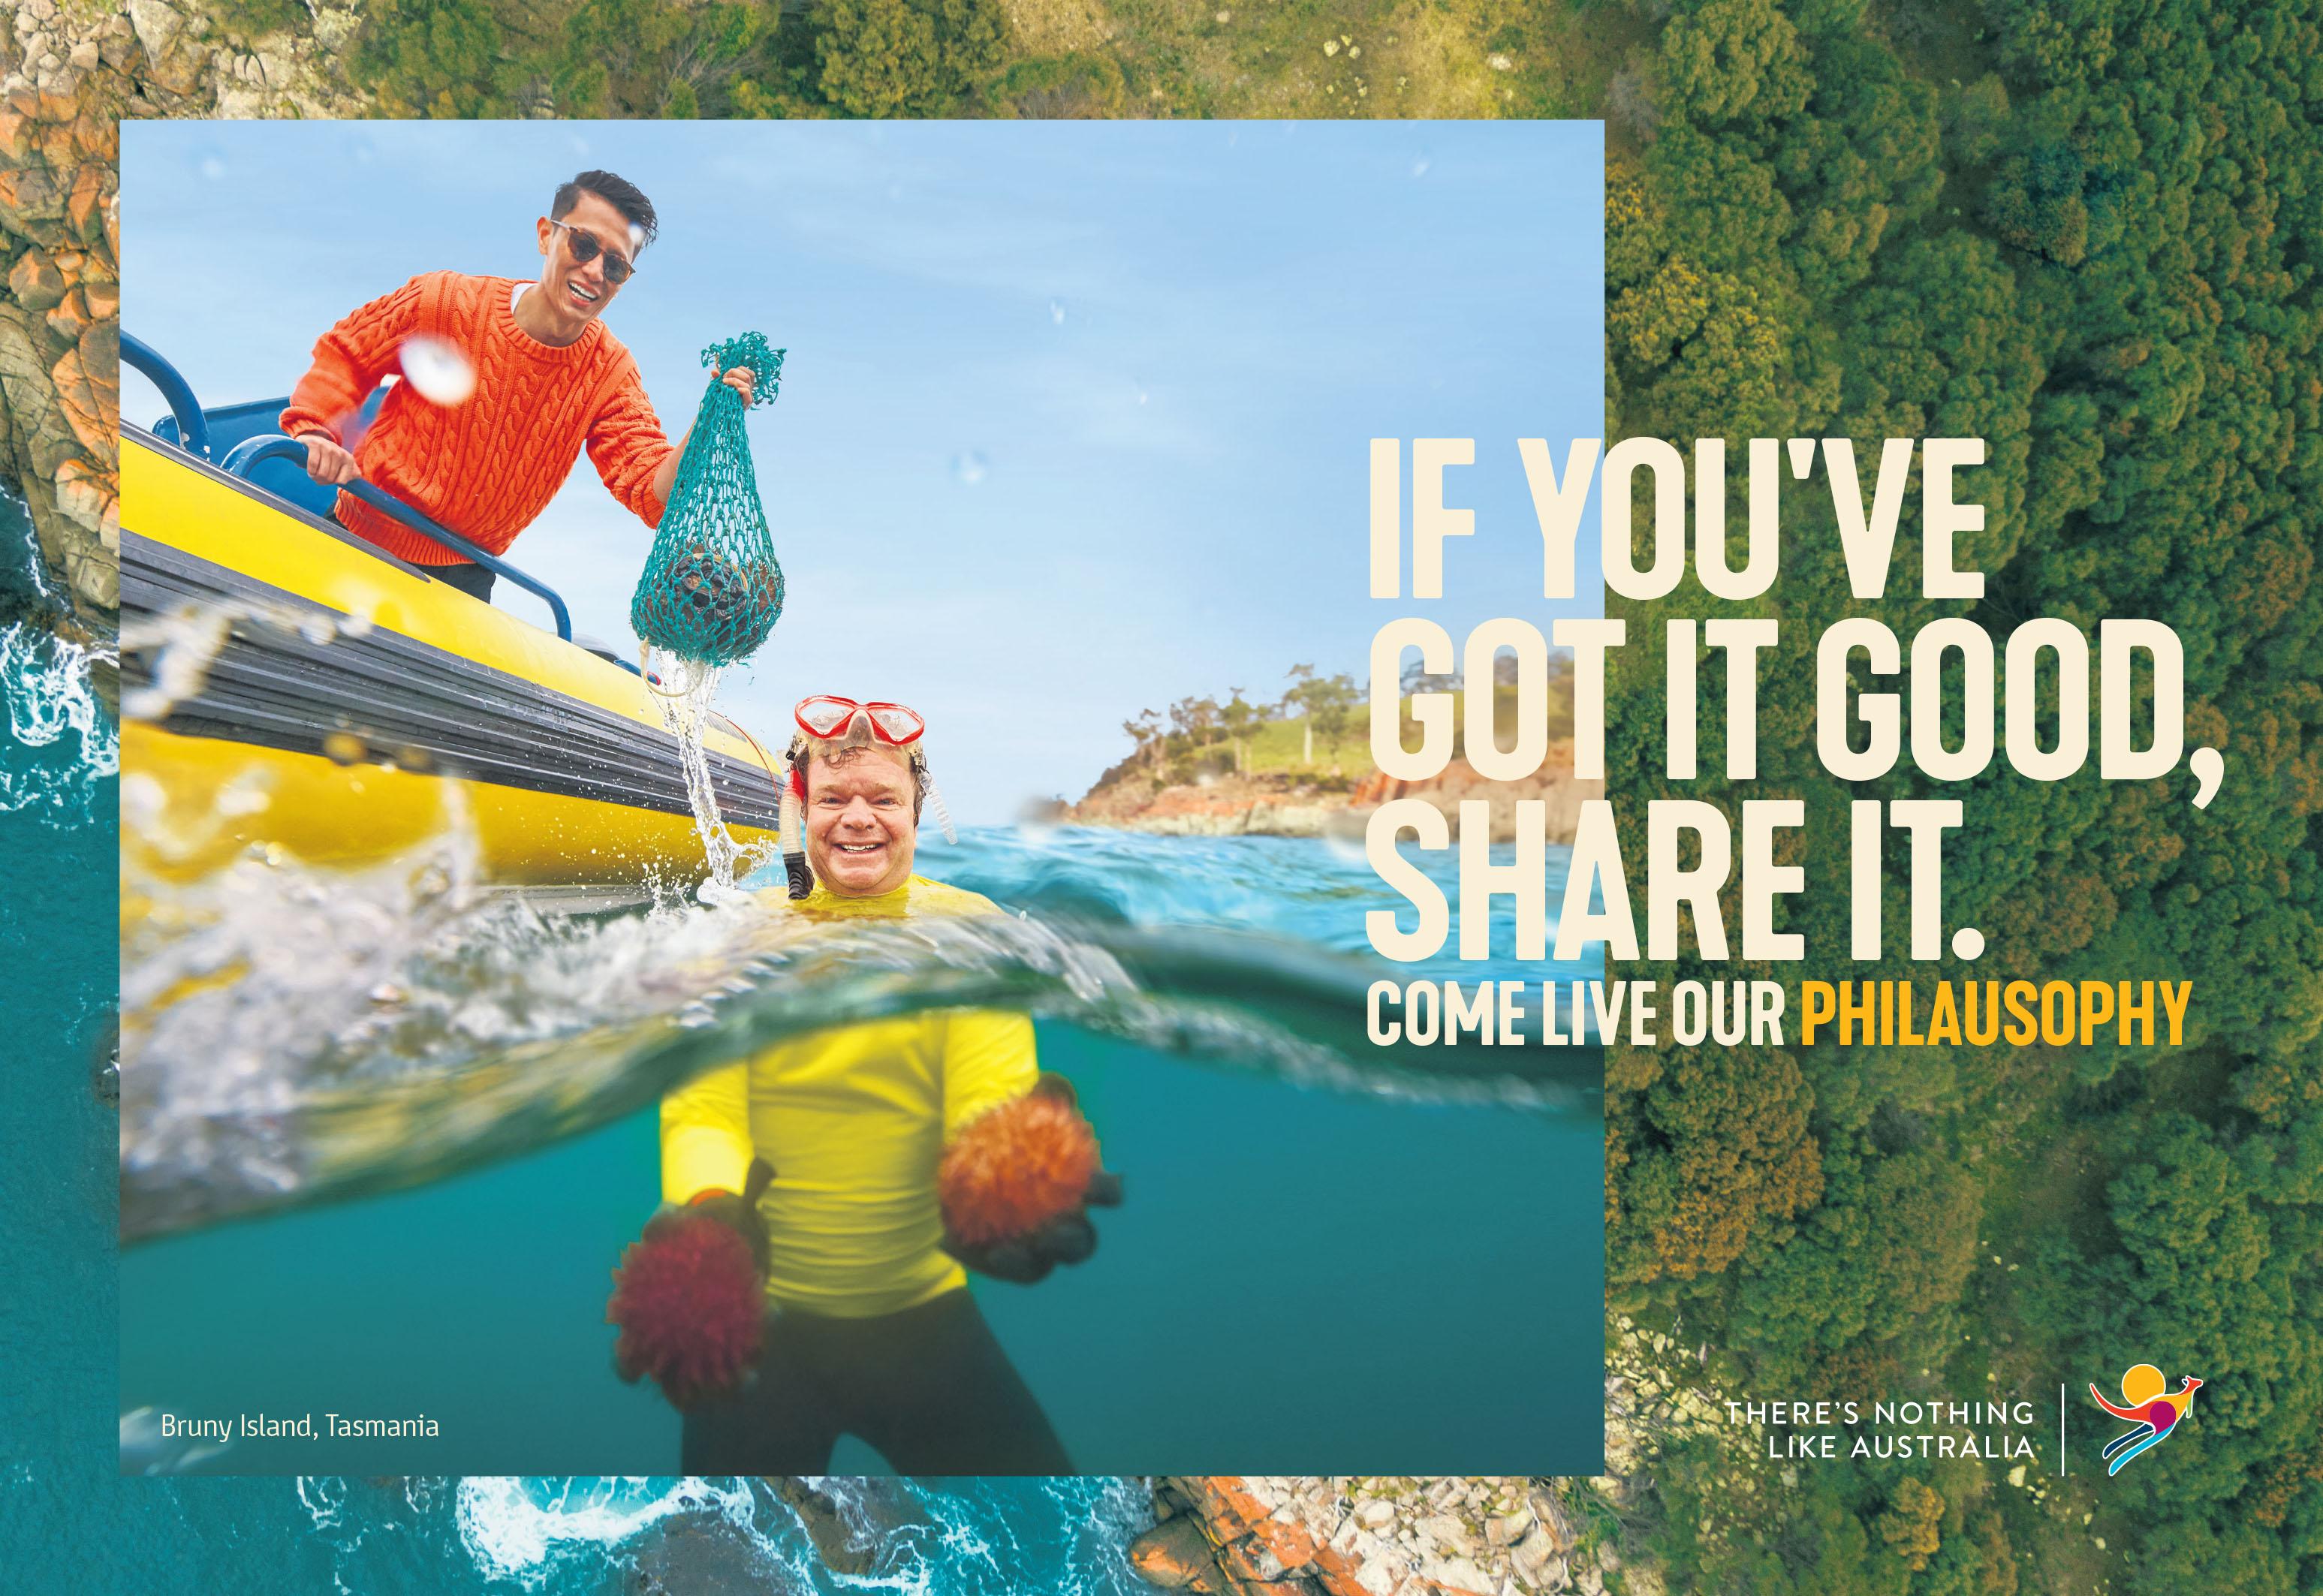 Tourism Australia invites the world to come and live Australia's Philausophy in major global campaign via M&C Saatchi Sydney, Digitas and UM